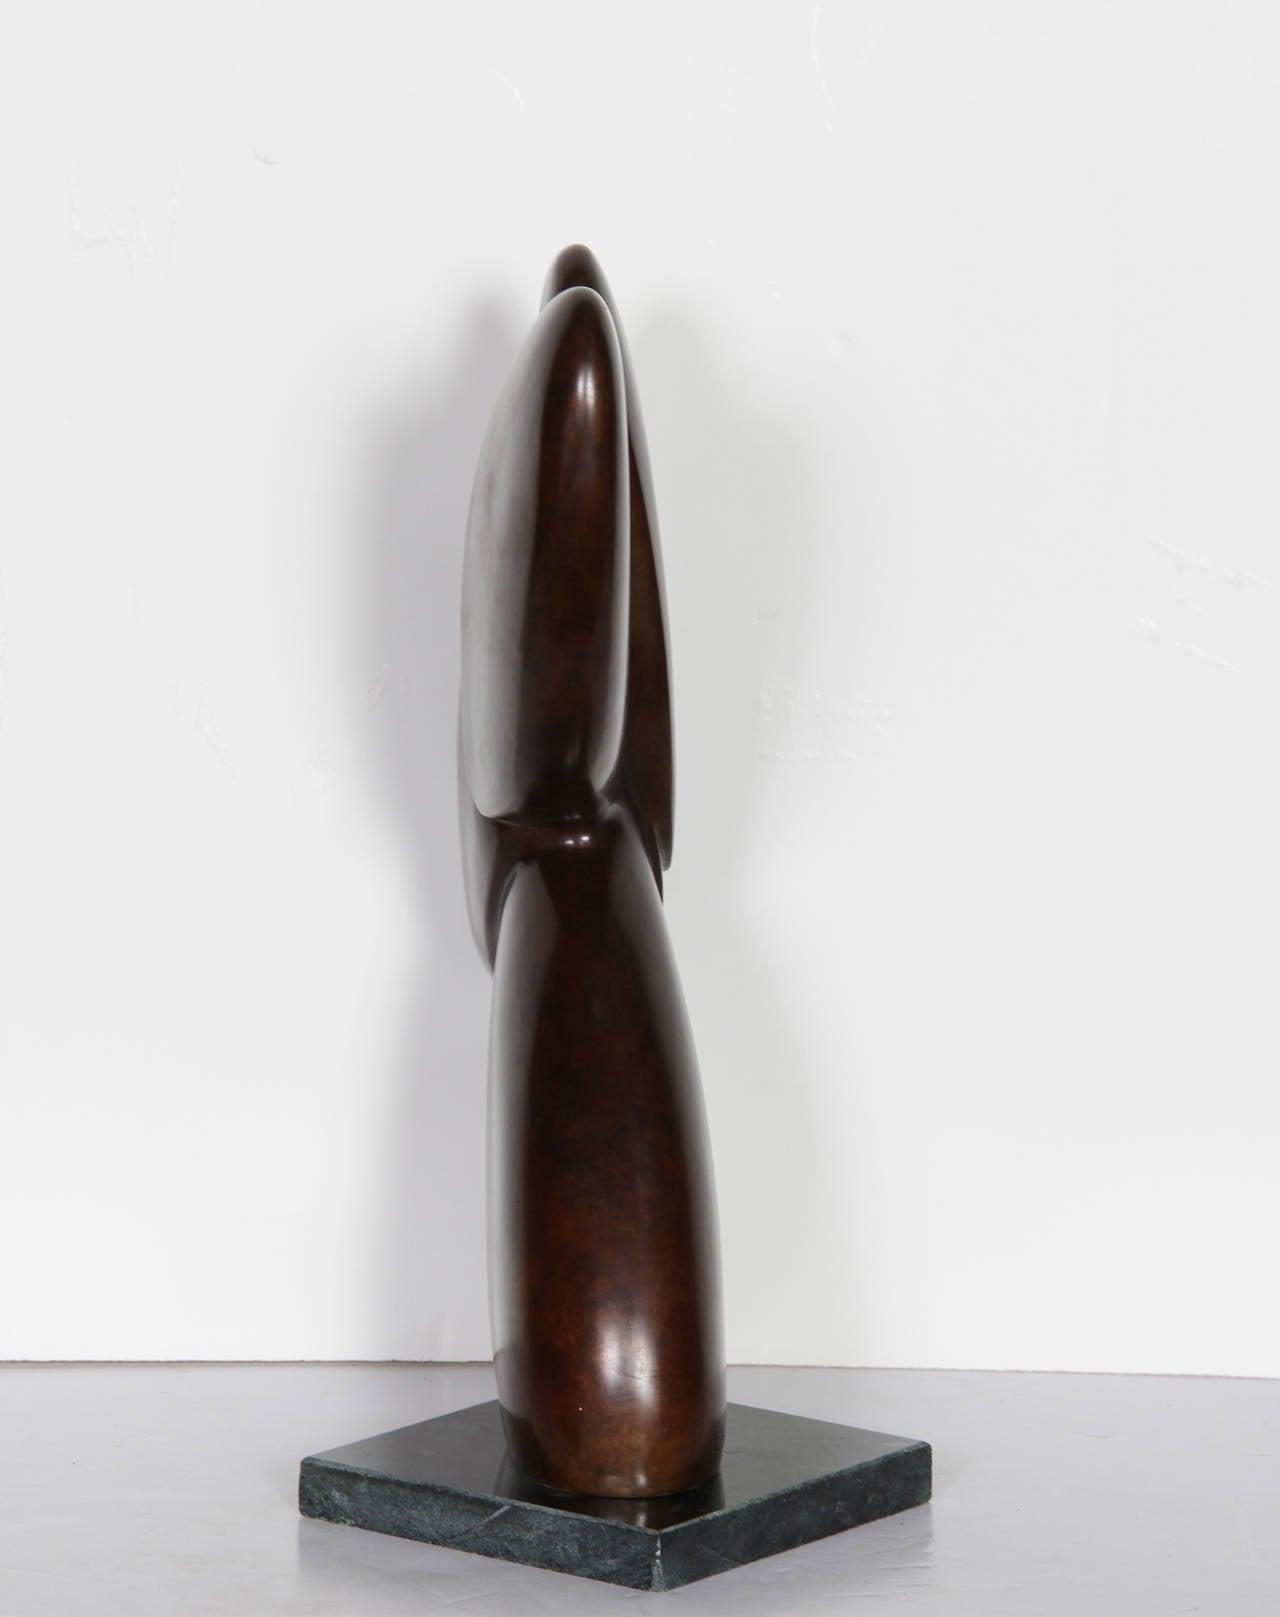 Rabbit - Abstract Sculpture by Constantin Antonovici